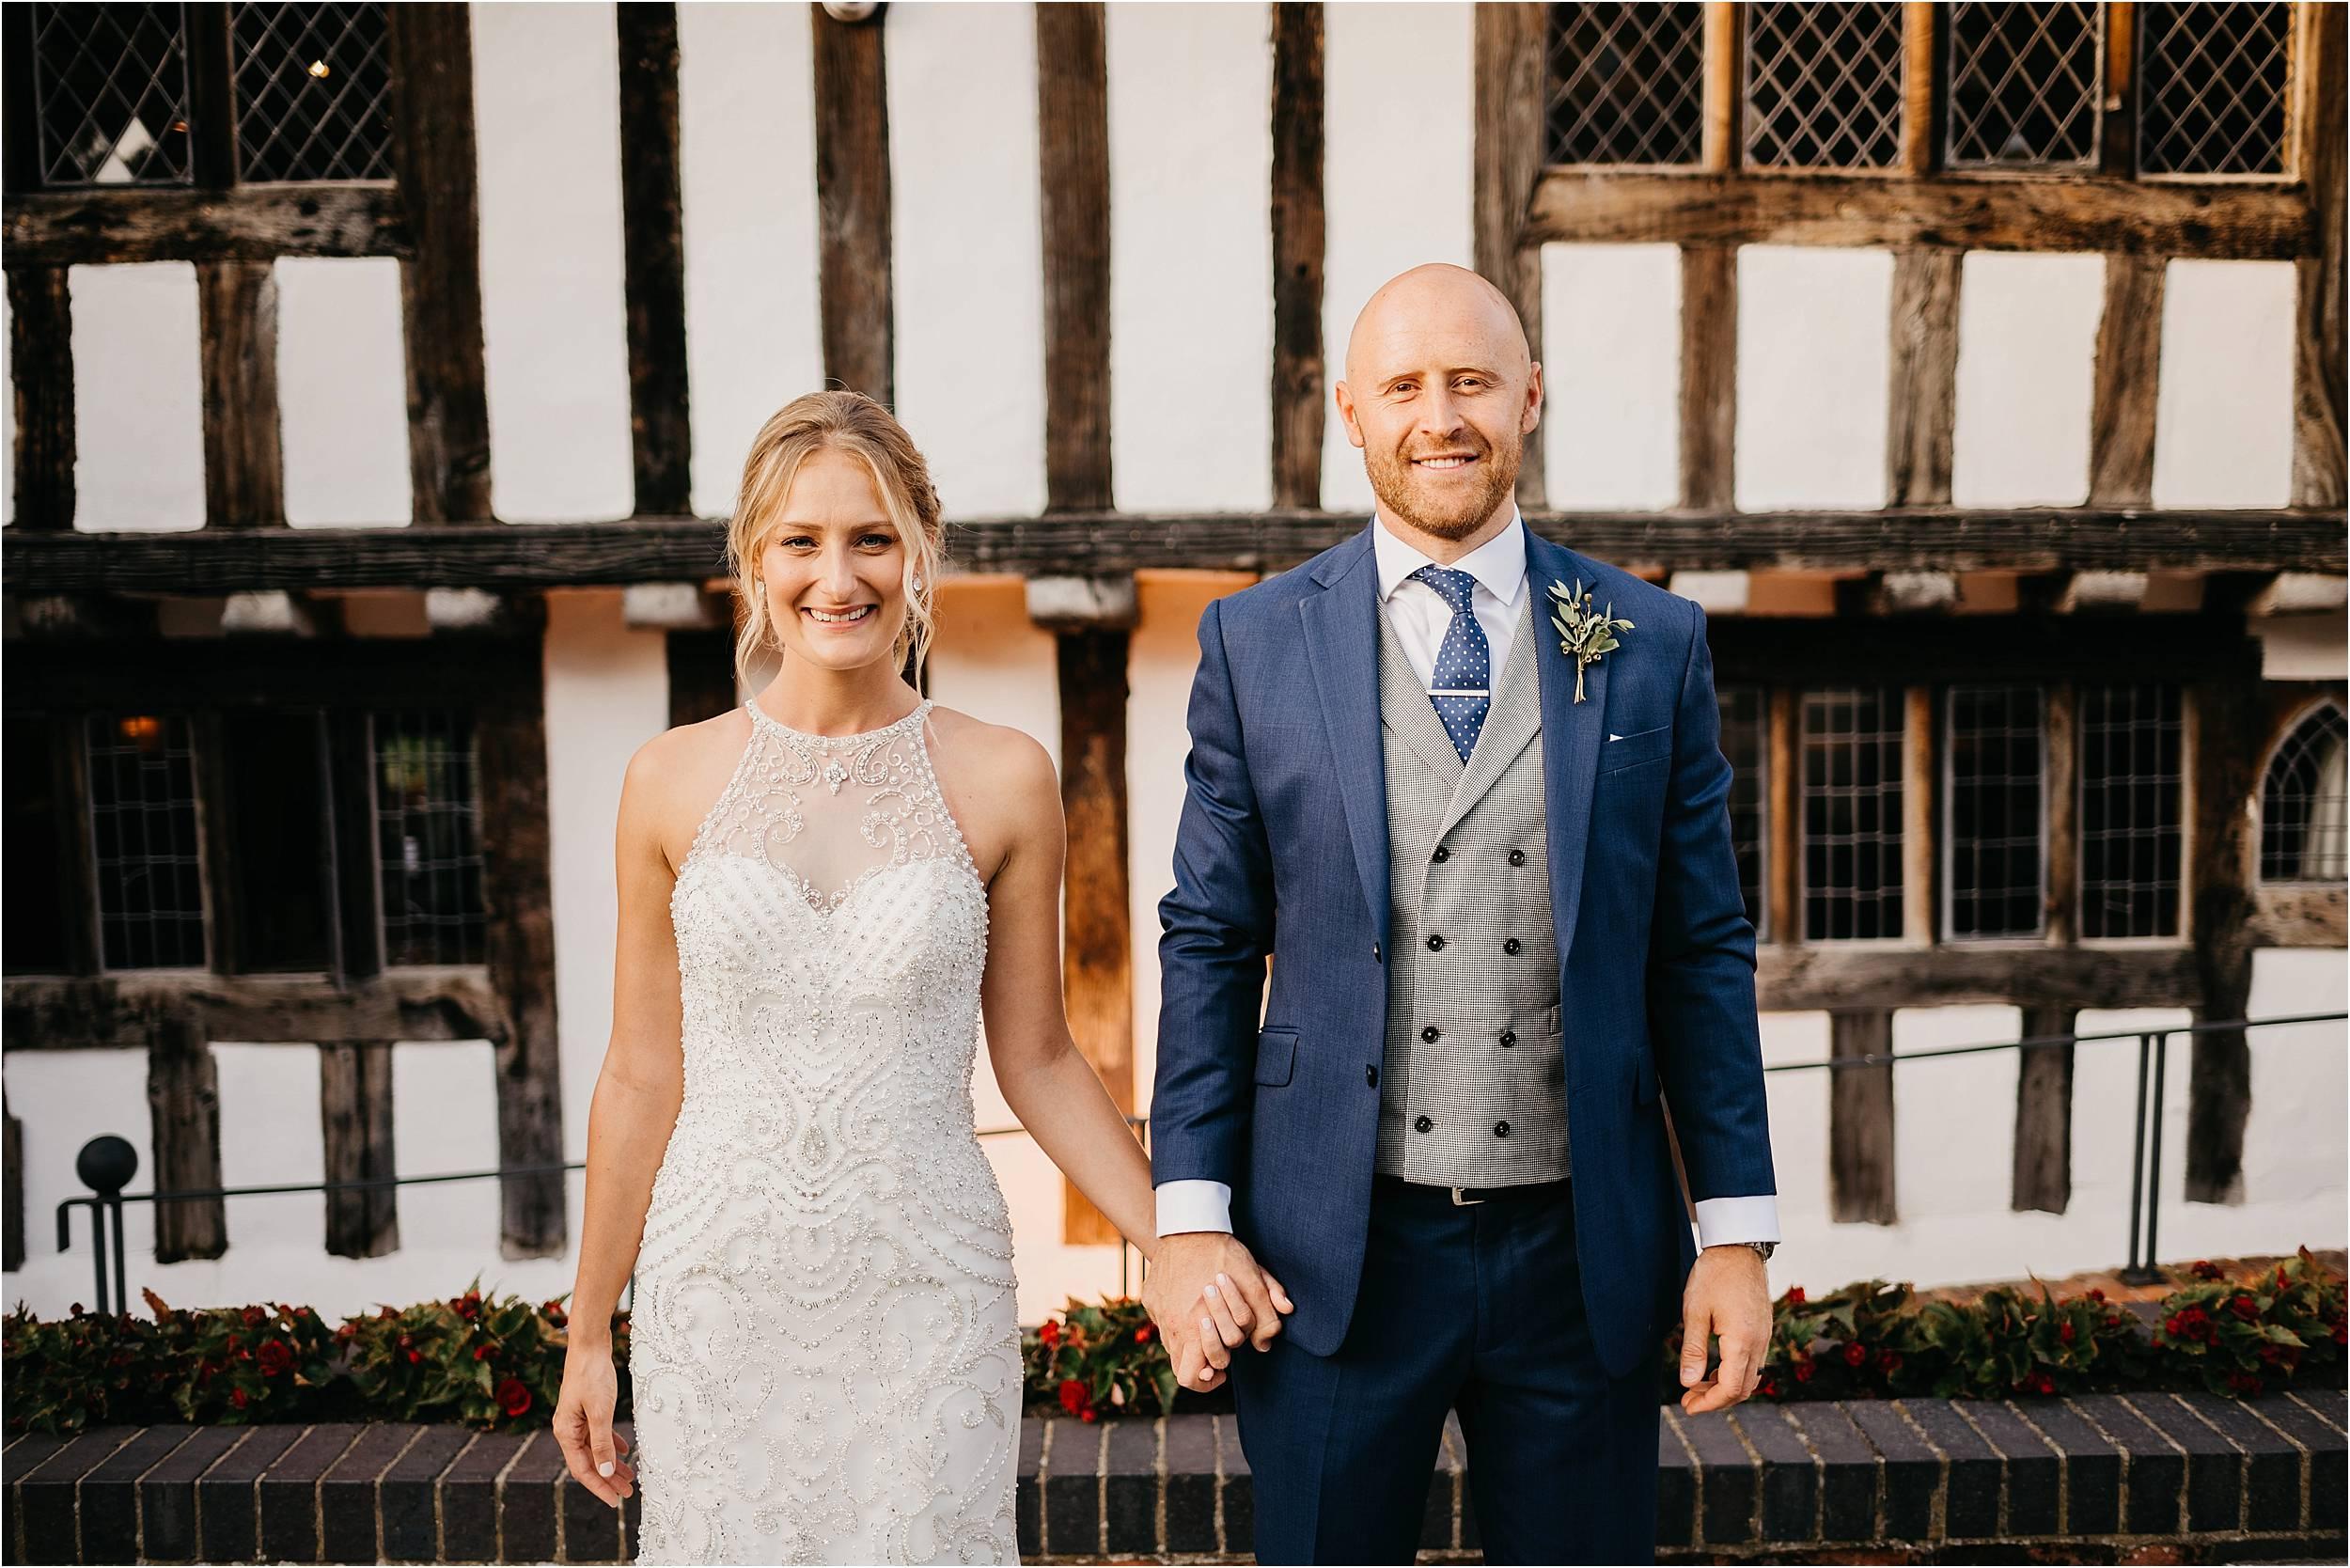 Essex Wedding Photography_0067.jpg